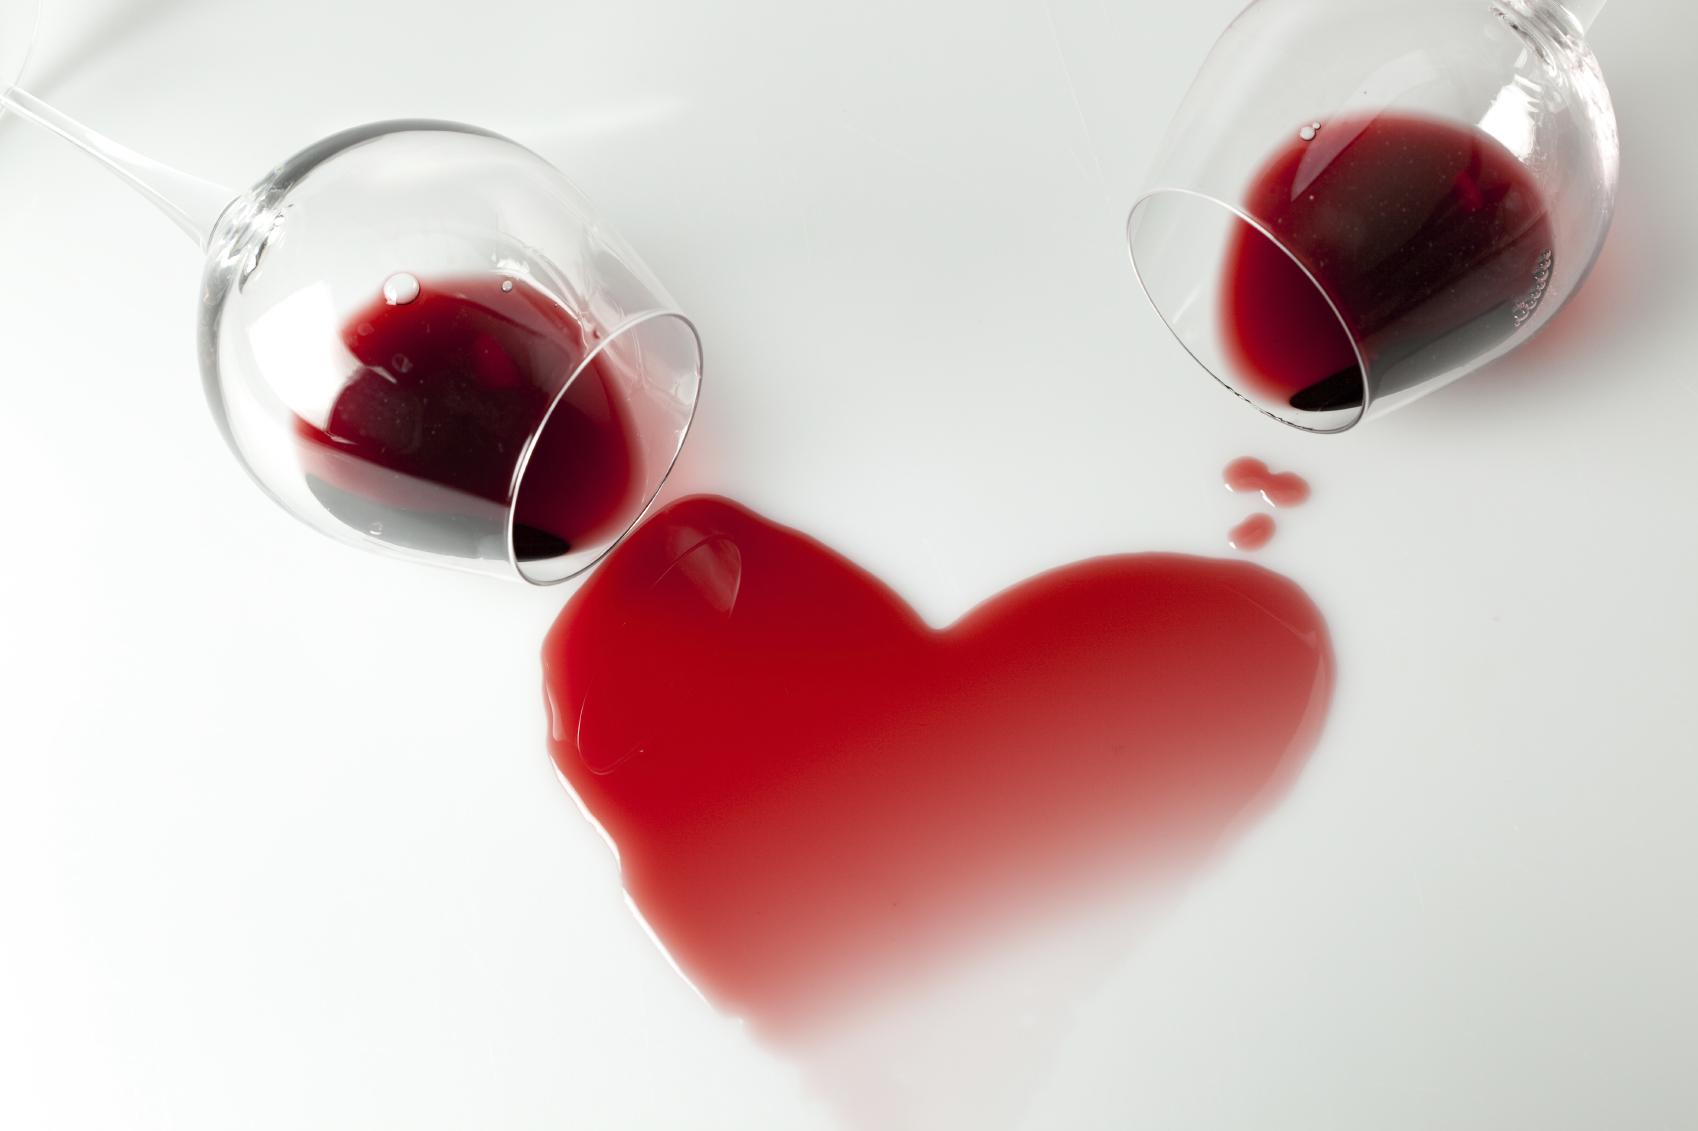 Image result for wine spilled in heart shape